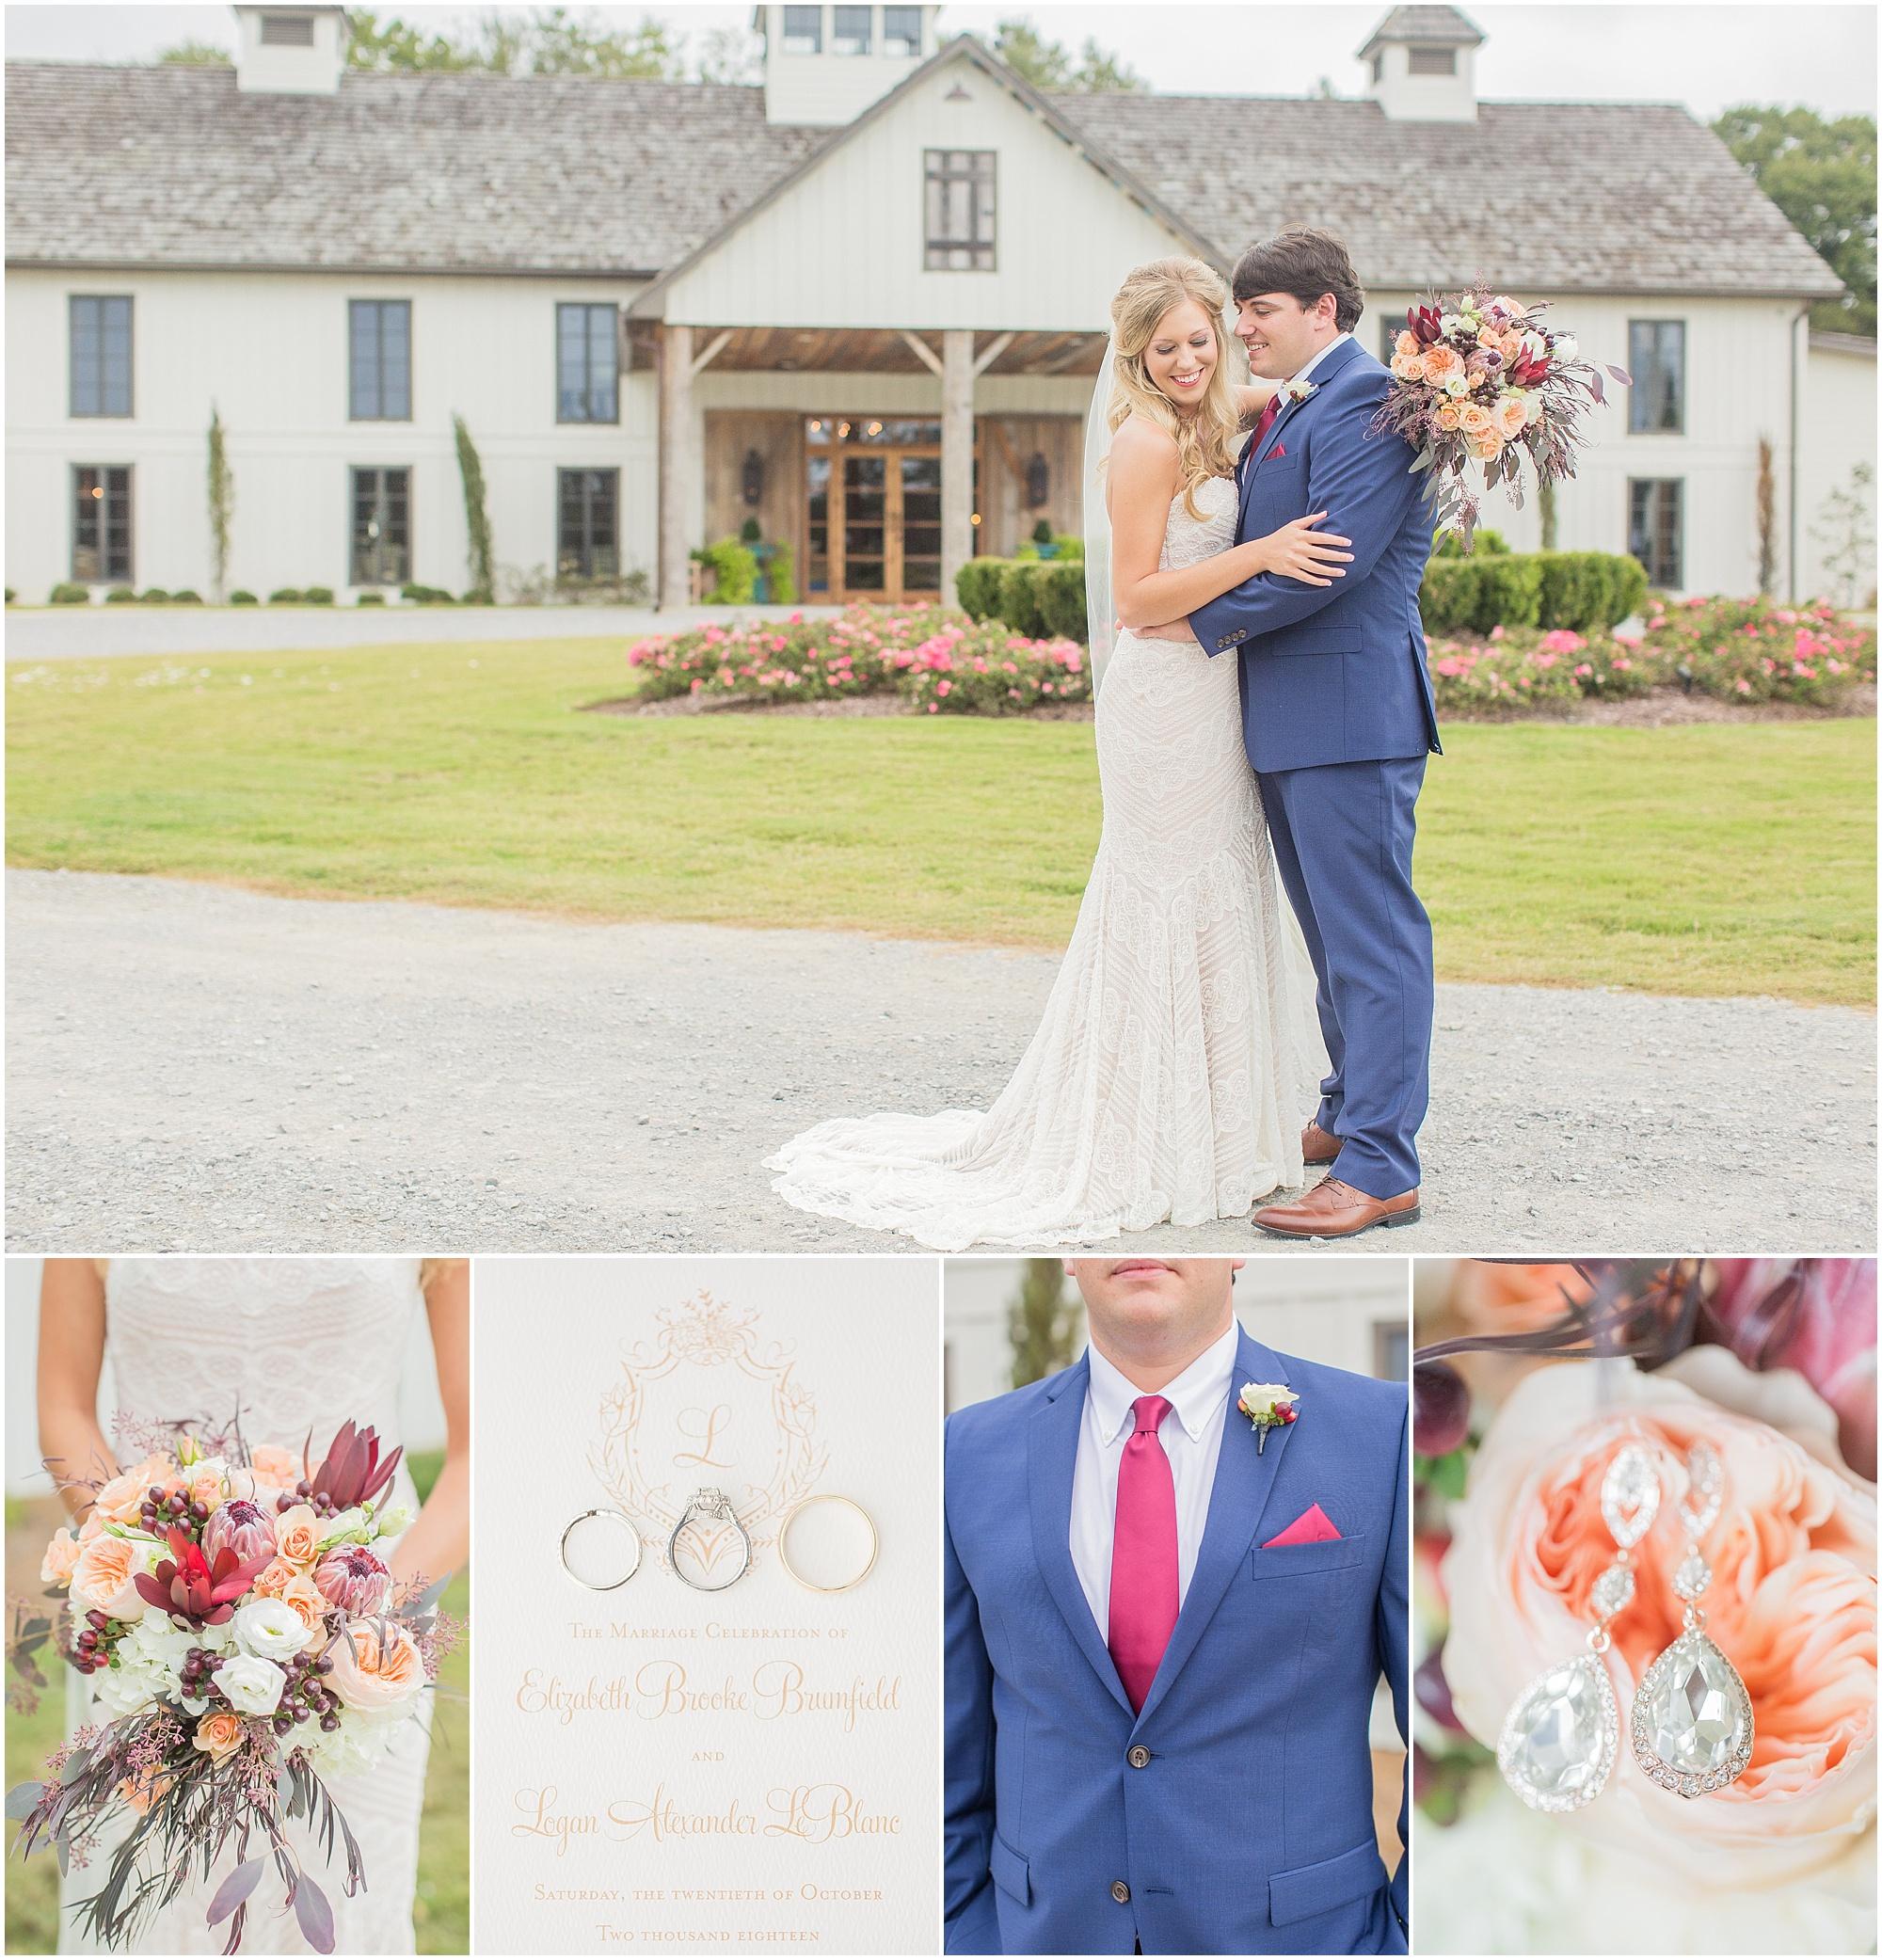 mississippi-wedding-bridlewood-of-madison_0001.jpg